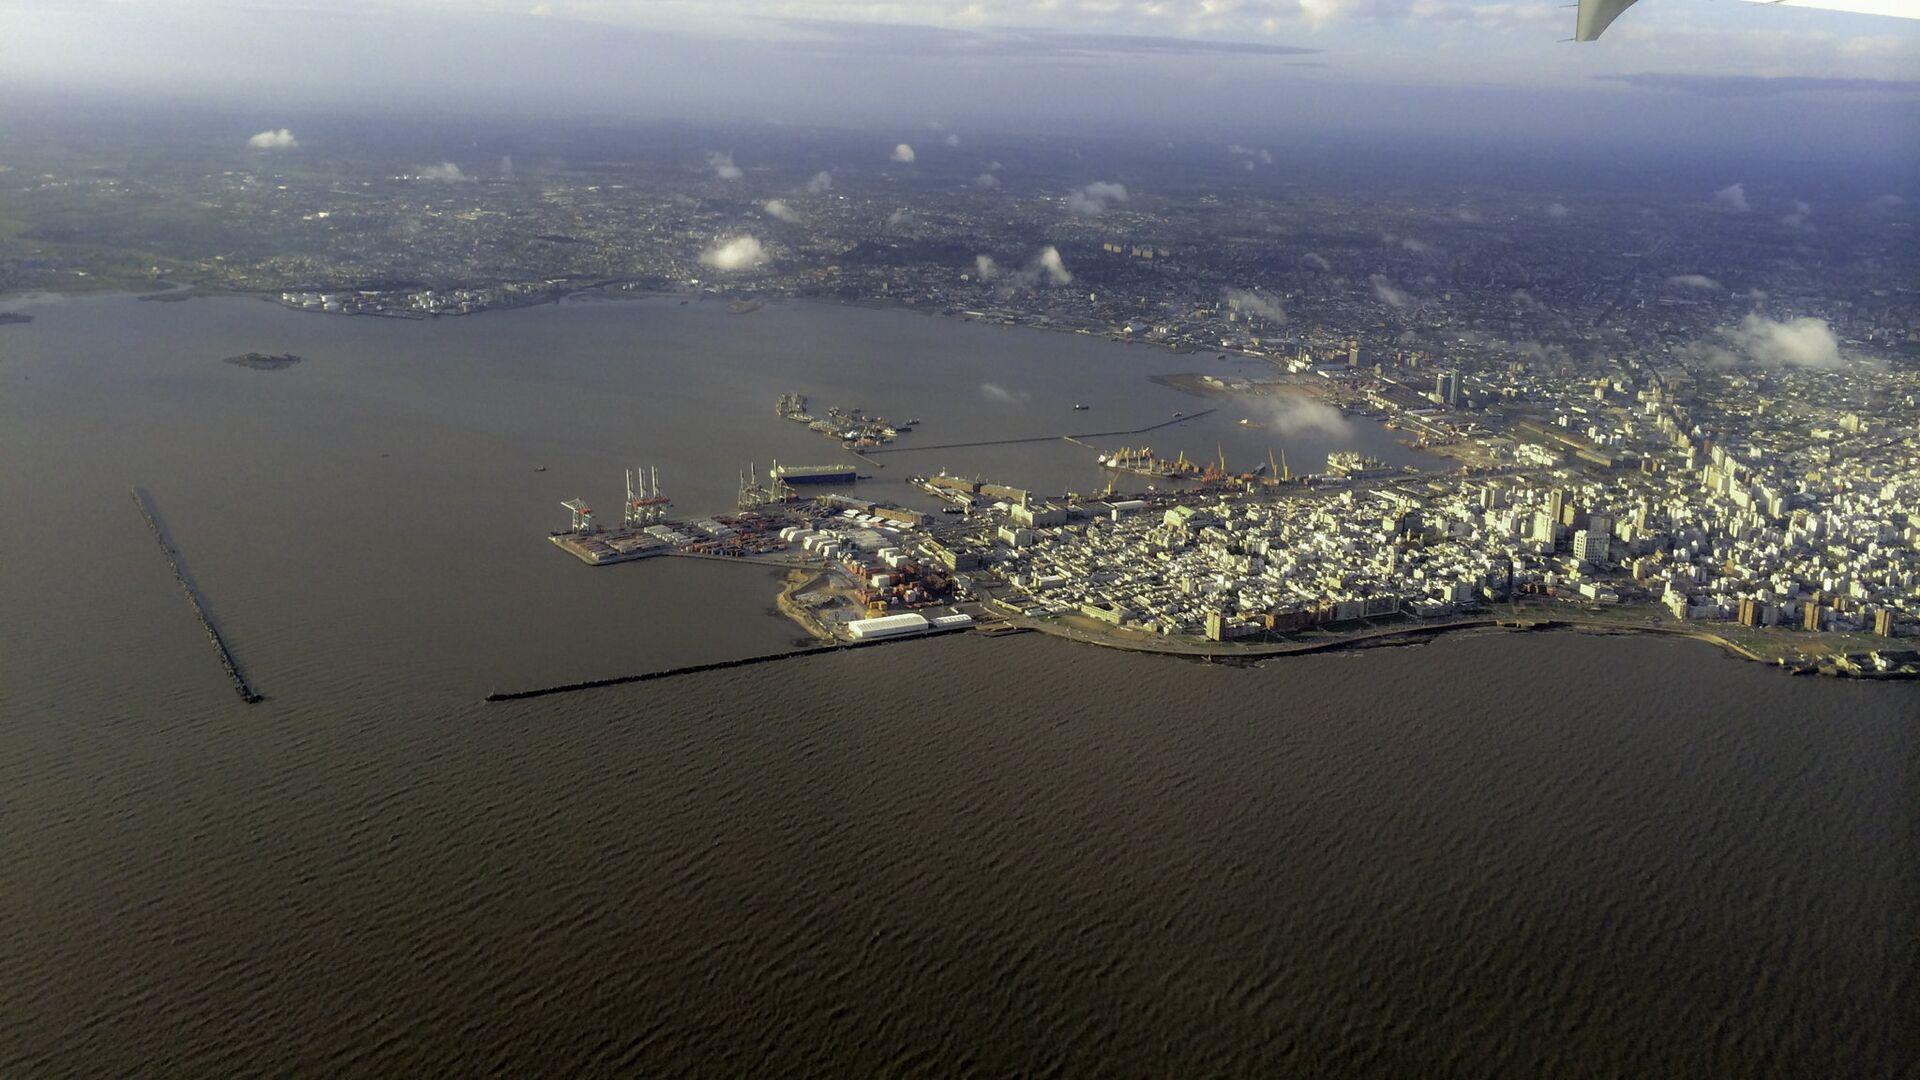 El puerto de Montevideo (archivo) - Sputnik Mundo, 1920, 23.04.2021